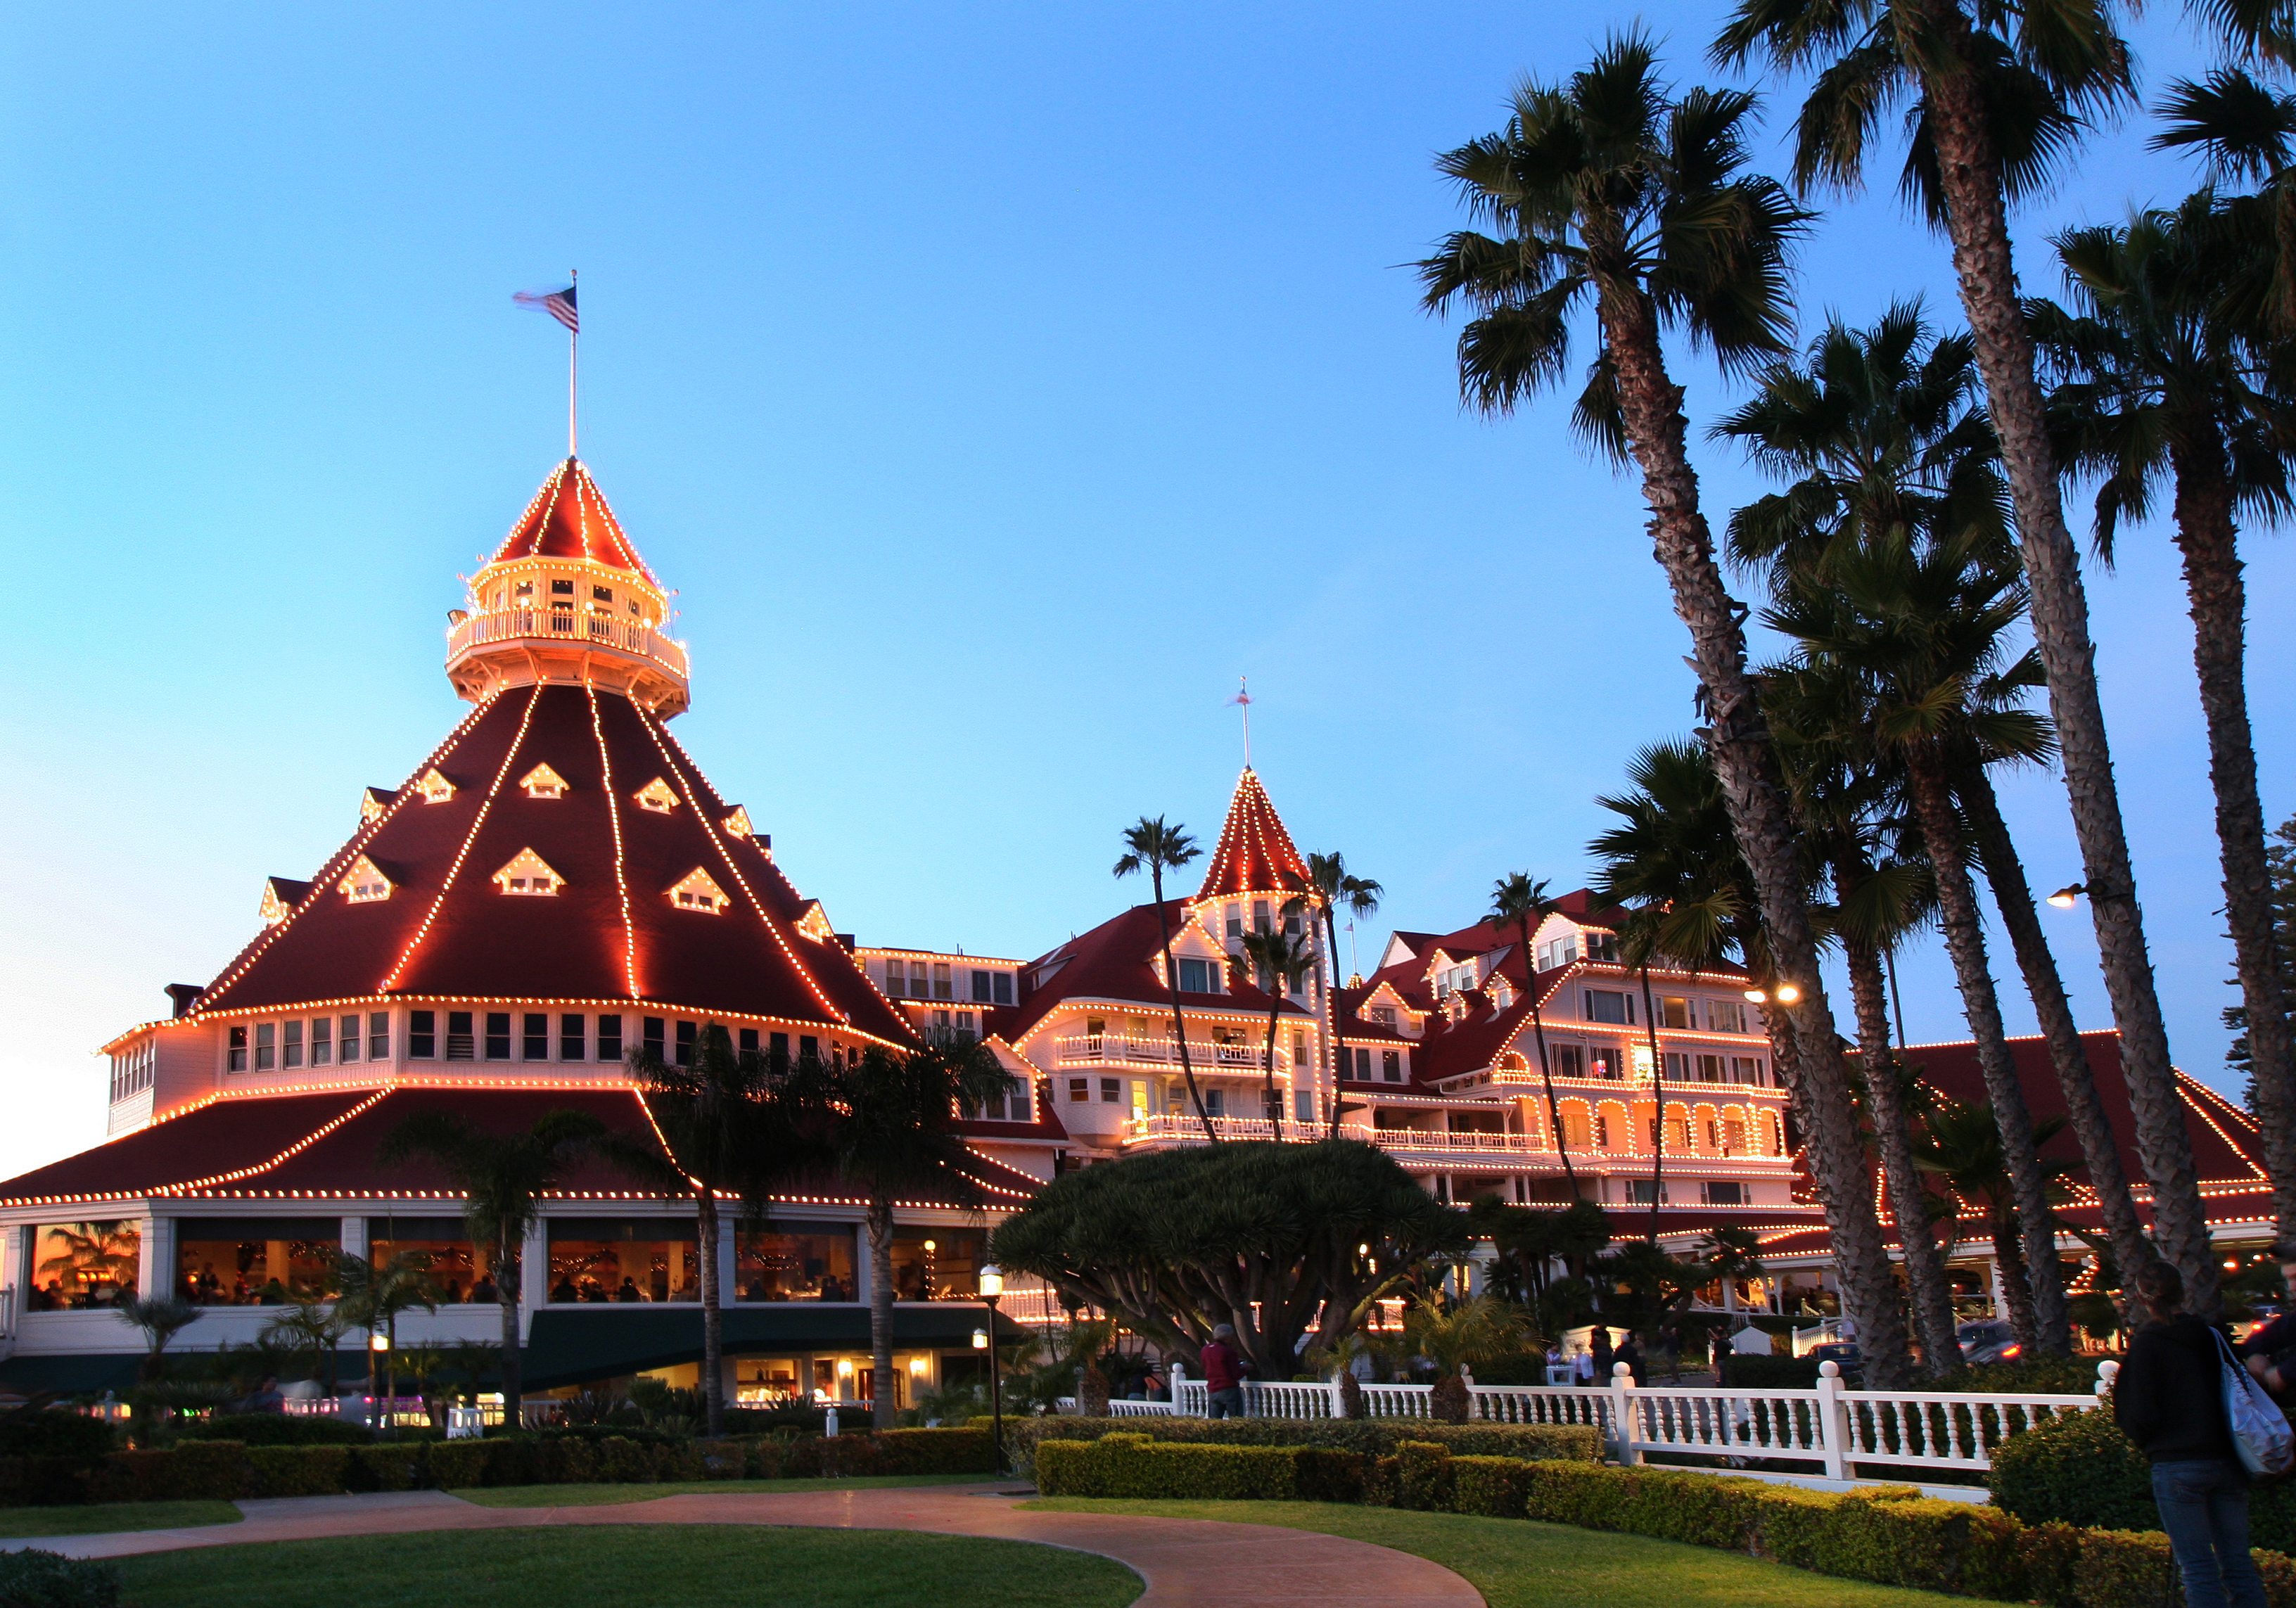 Coronado hoteldel holidaylightsdusk san diego travel blog for Haunted hotel in san diego